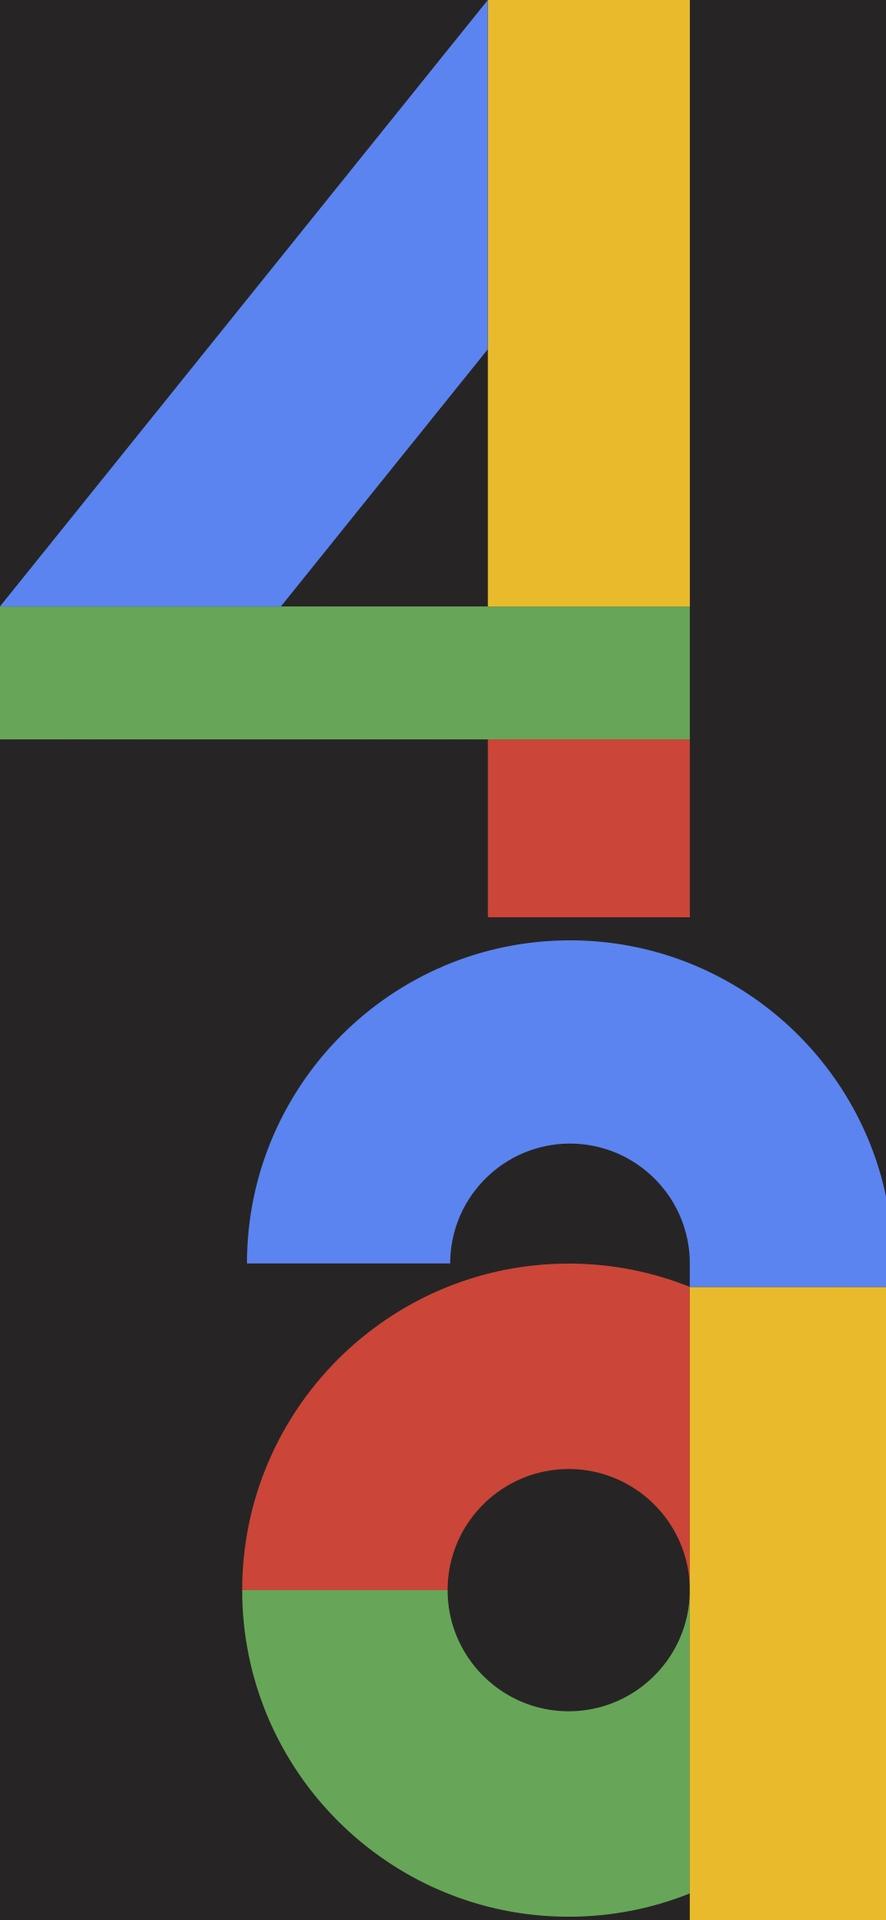 Google Pixel 4a wallpapers 1